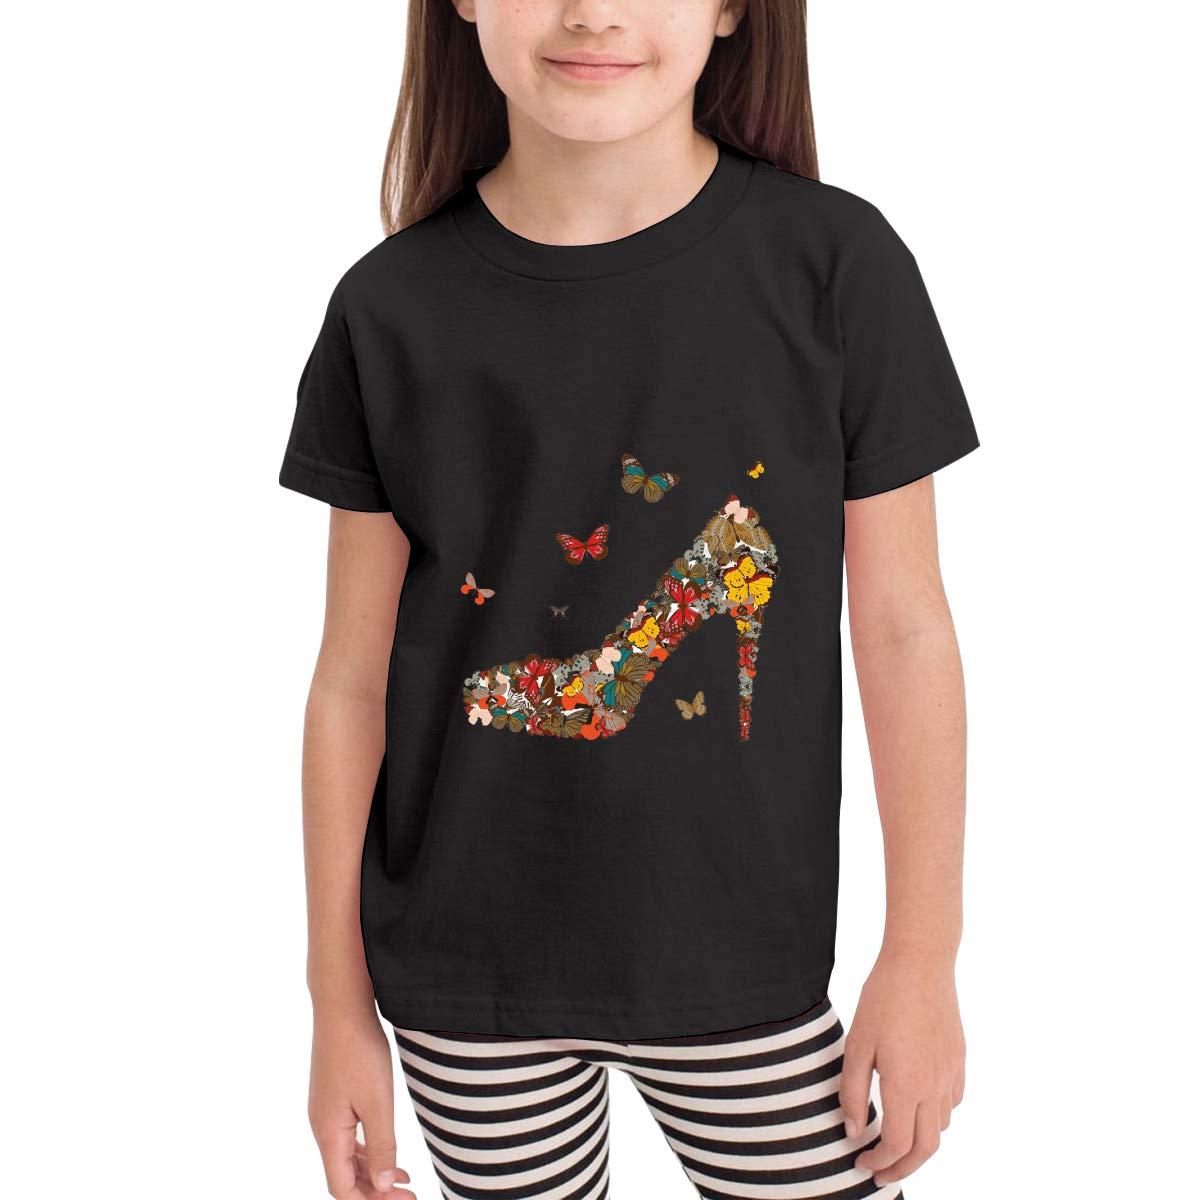 Butterfly High Heel 100/% Cotton Toddler Baby Boys Girls Kids Short Sleeve T Shirt Top Tee Clothes 2-6 T